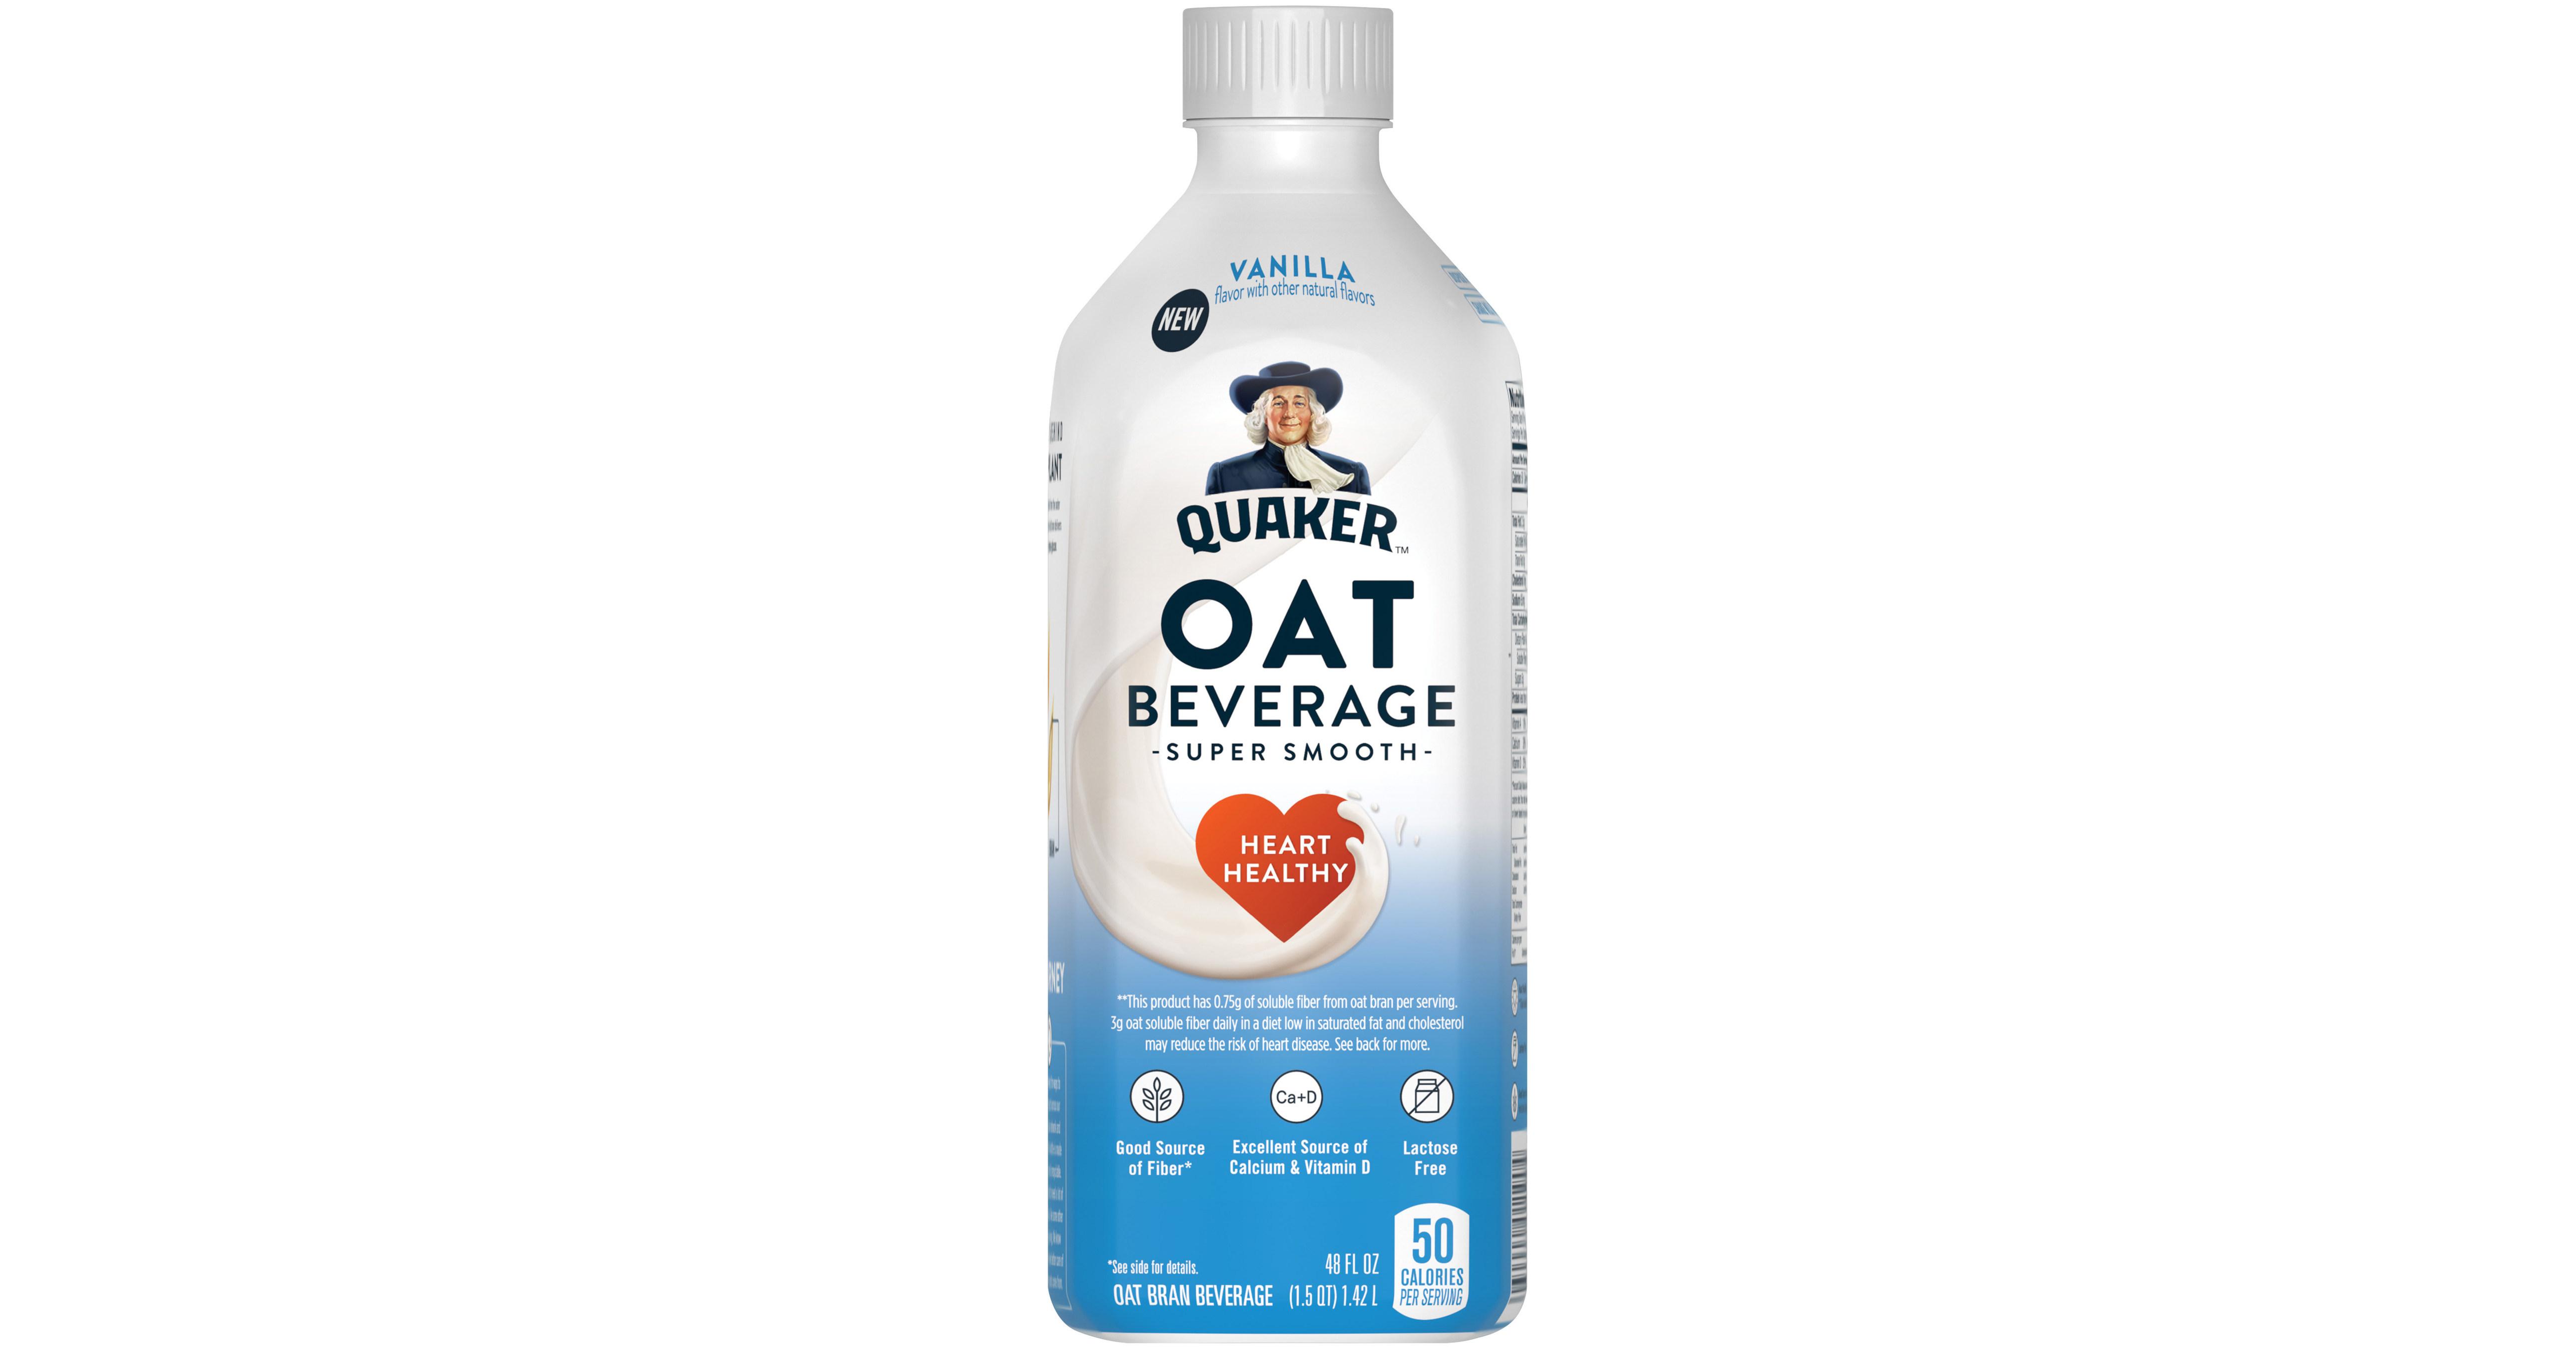 Quaker Oat Beverage Splashes Into Dairy-Alternative Market